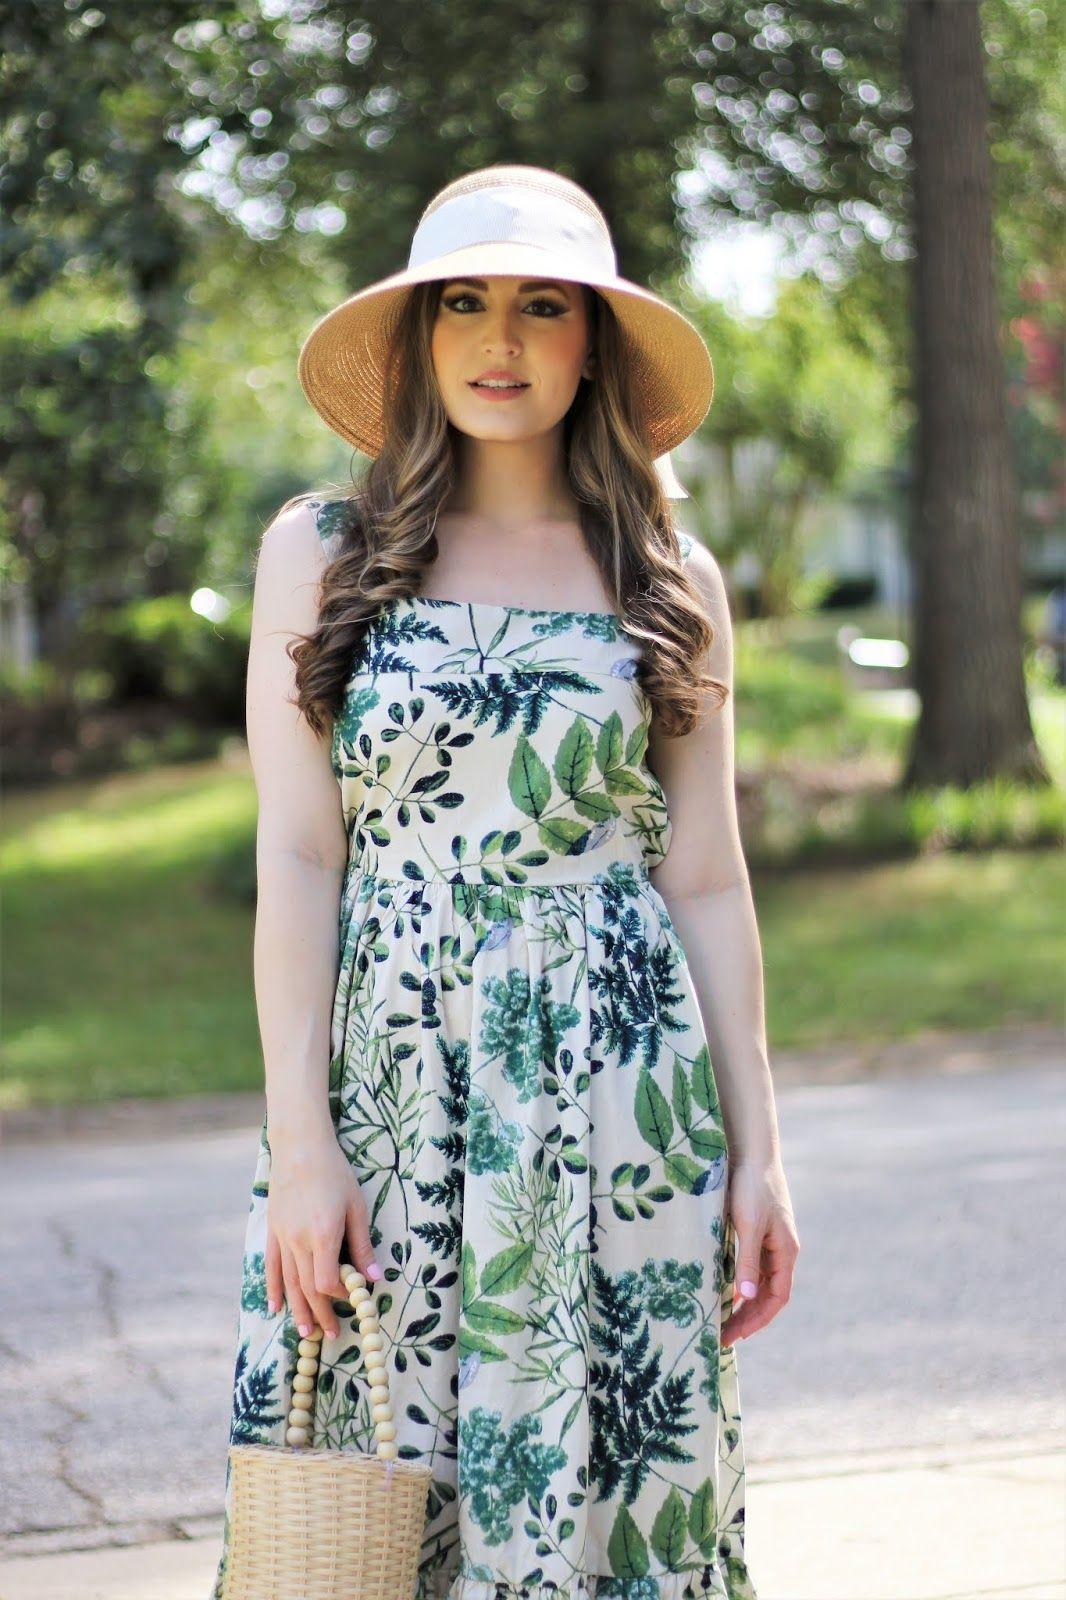 Tropical Vibes Summer Sundresses Summer Sundresses Sundress Shop Summer Dresses [ 1600 x 1066 Pixel ]